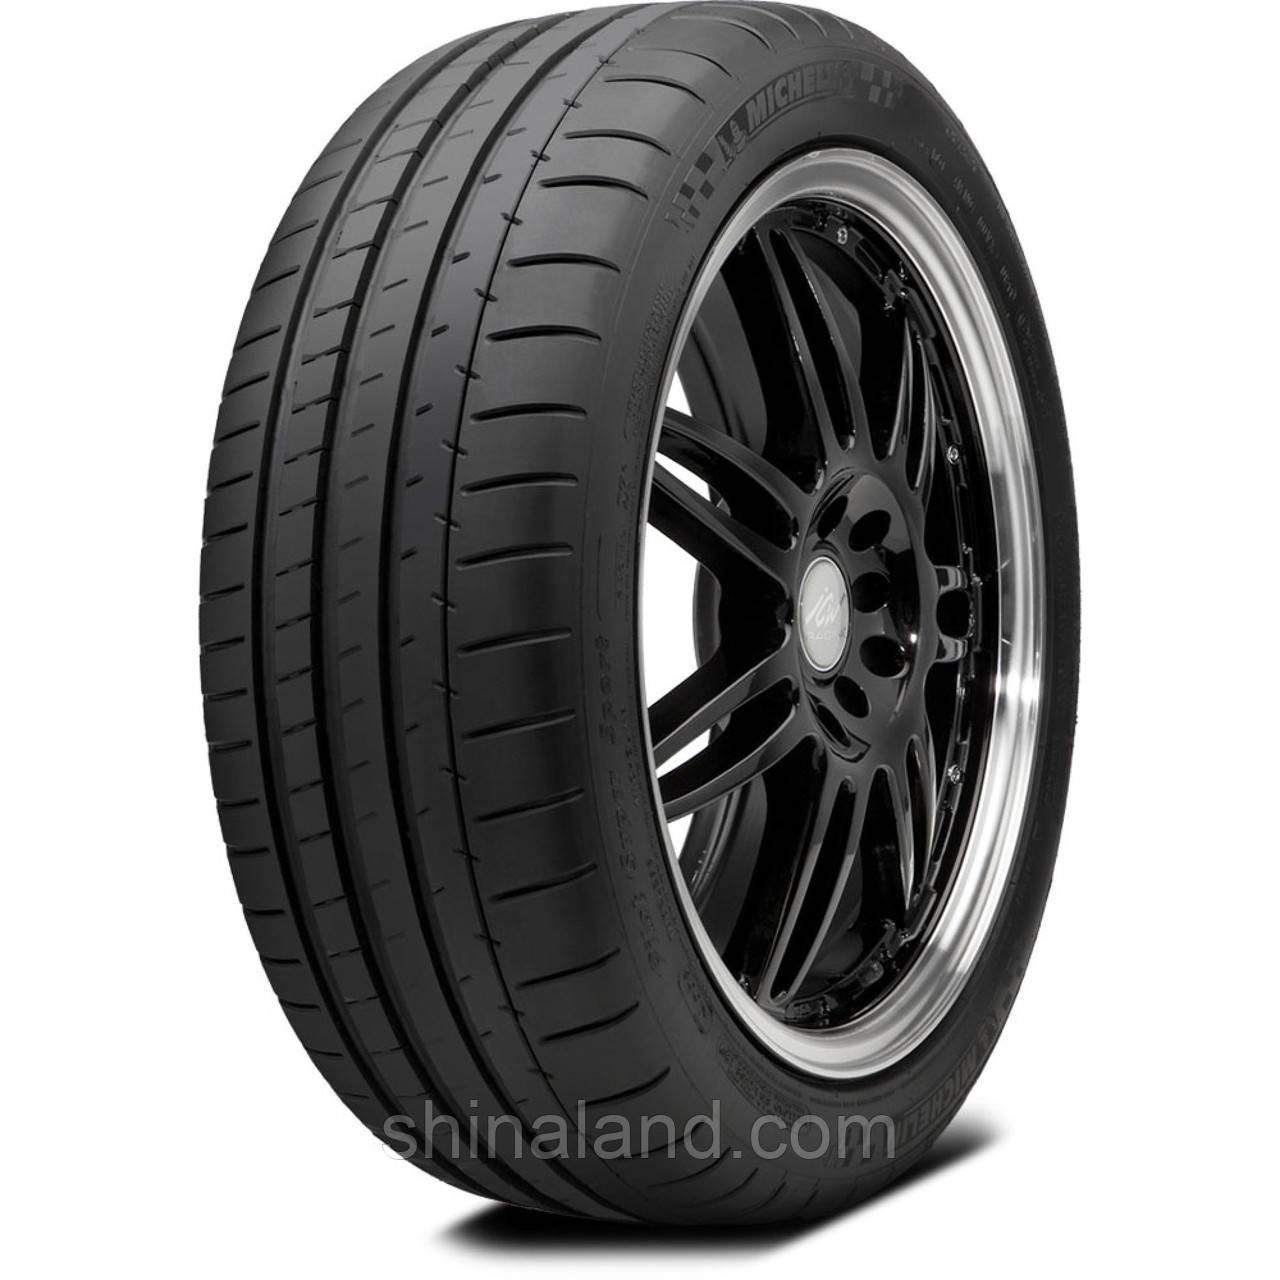 Шини Michelin Pilot Super Sport 245/40 R21 96Y RunFlat ZP Франція 2020 (літо) (кт)